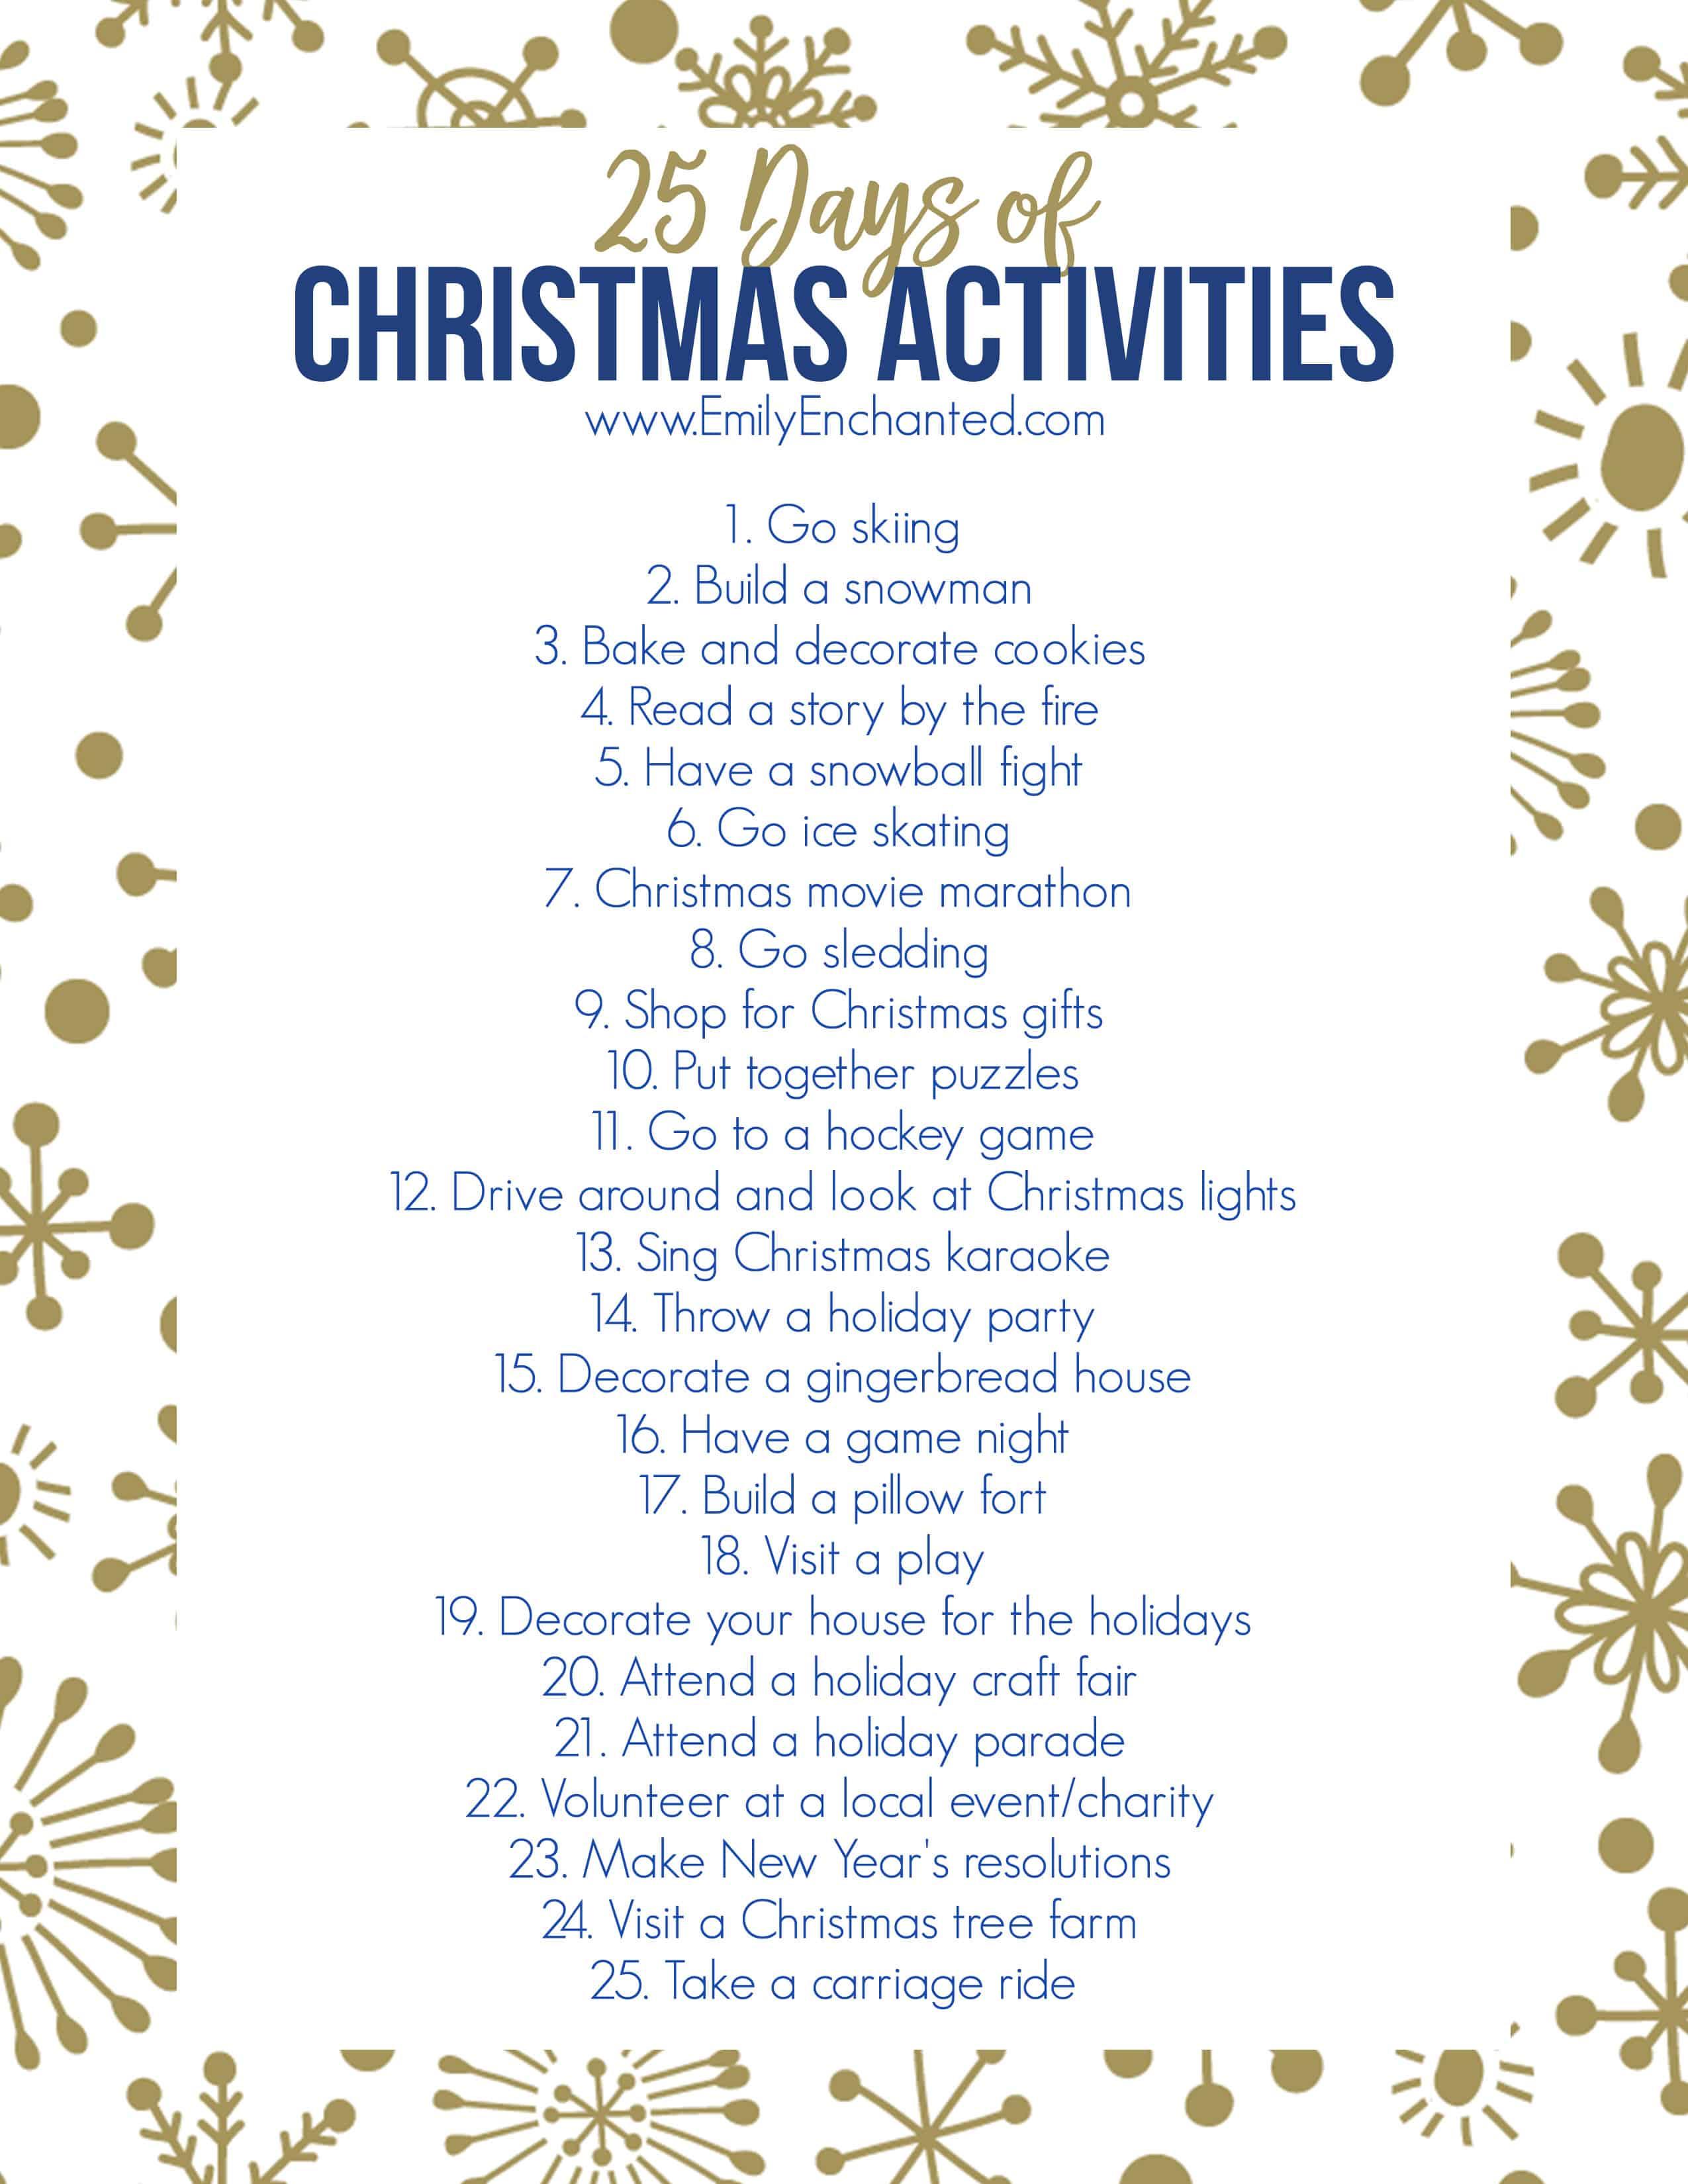 25 Days Of Christmas Activities Printable